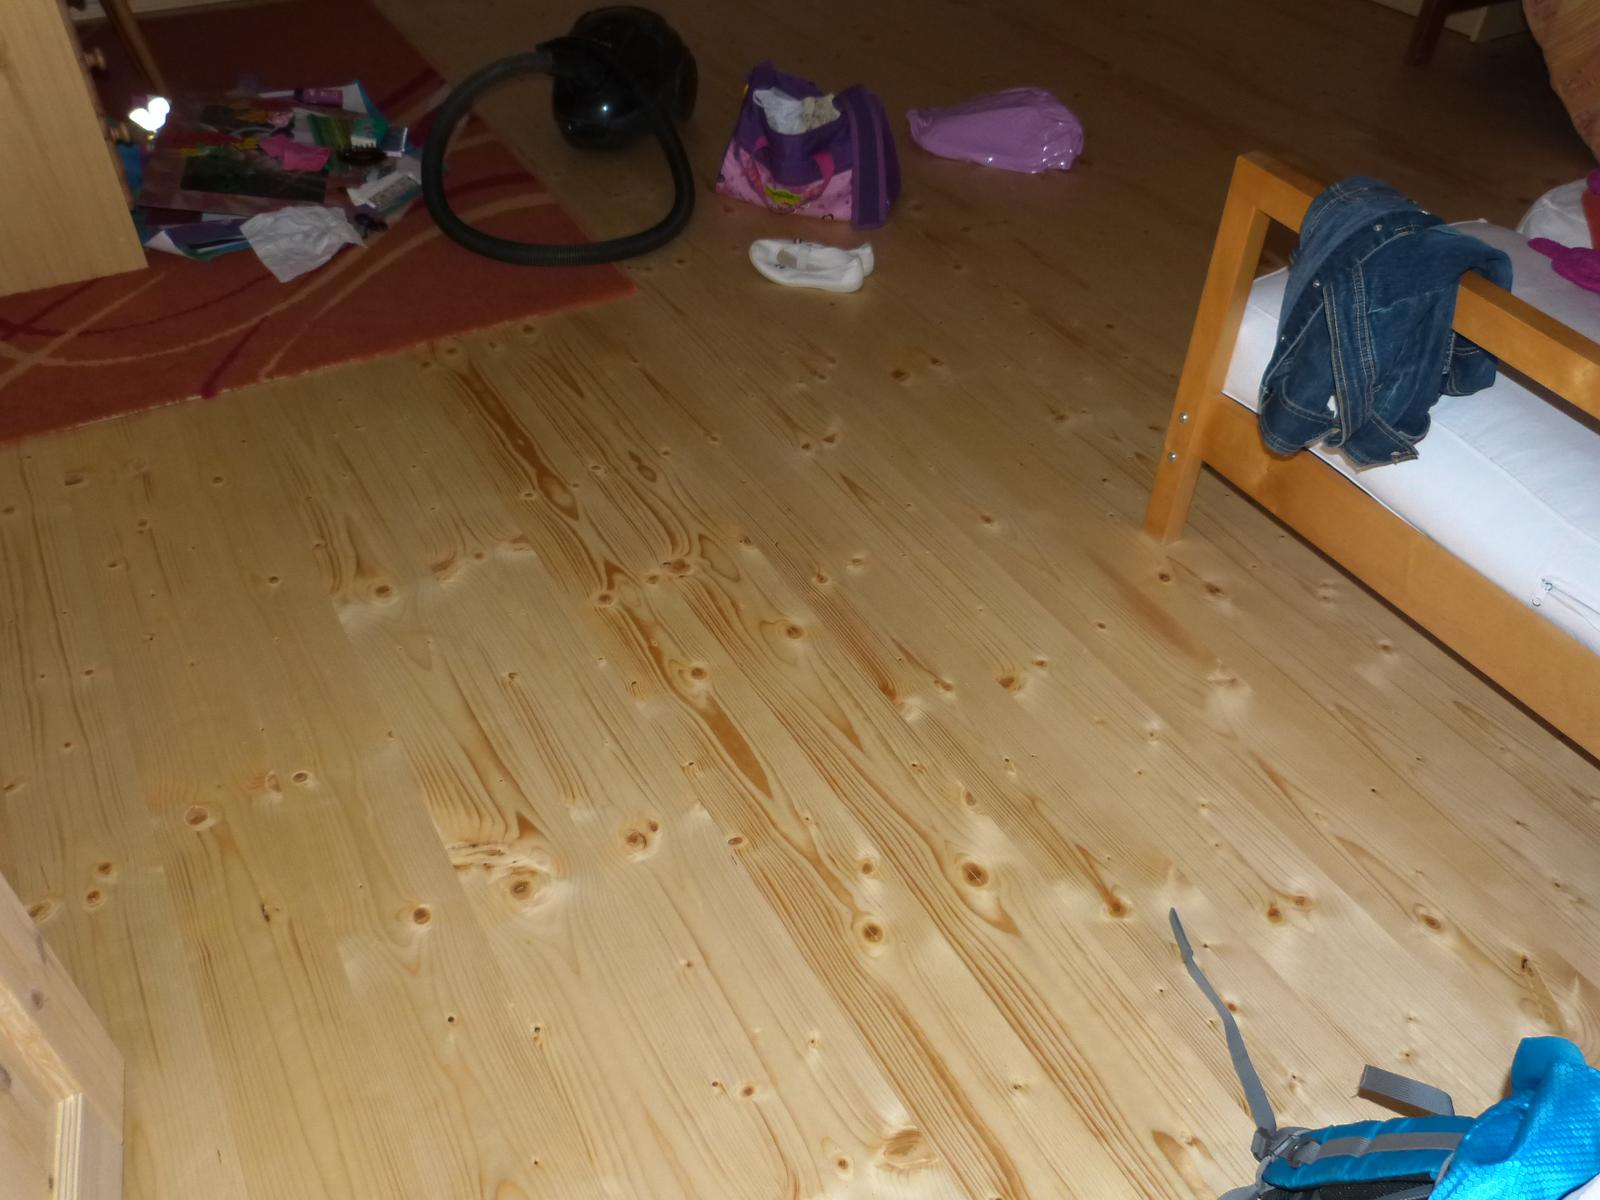 Podlahy - Podlaha v pokojíku dcerky